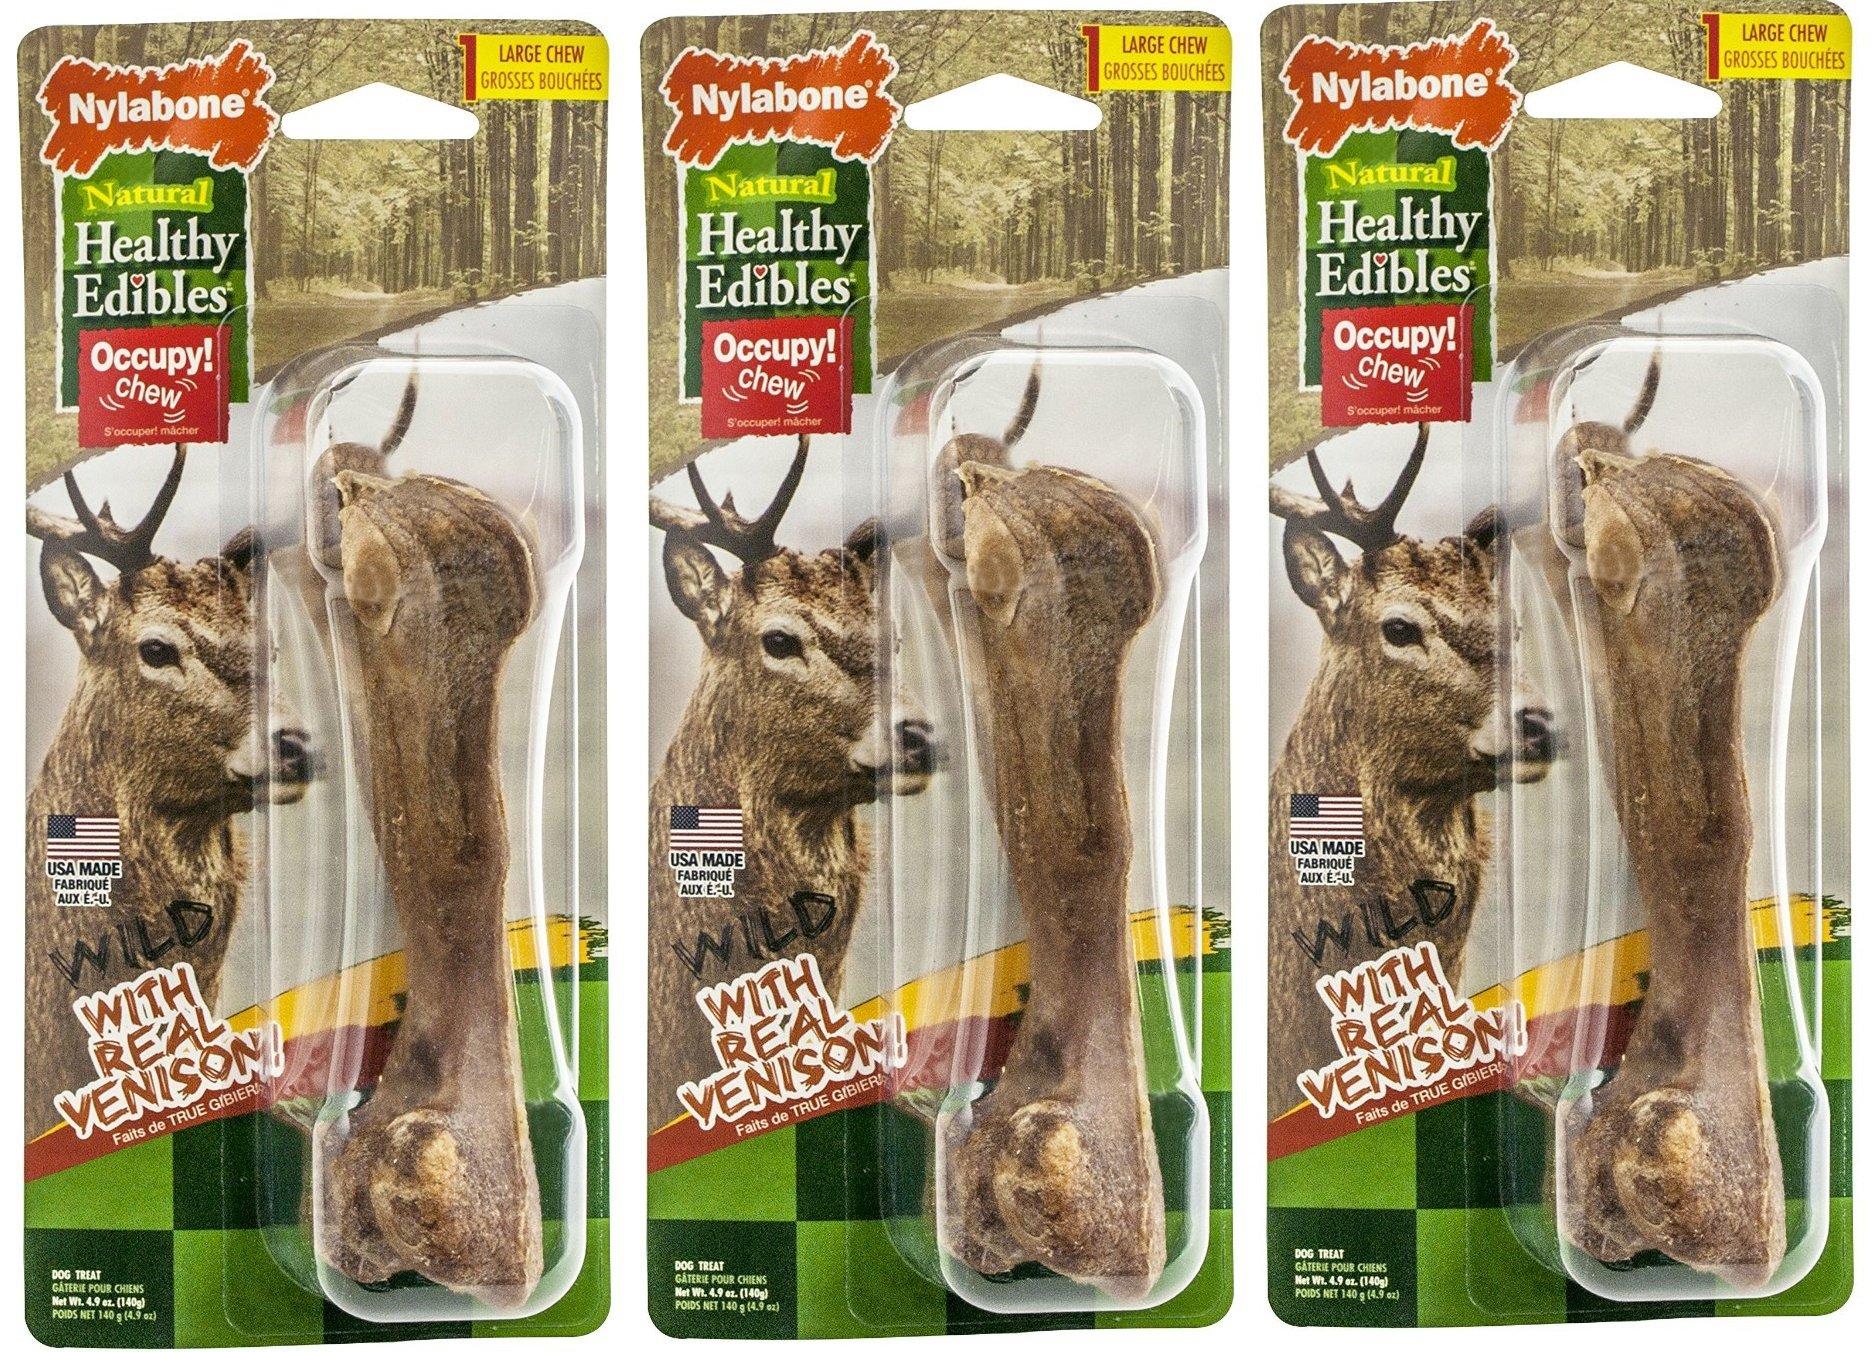 Nylabone 3 Pack Of Healthy Edibles Wild Venison Dog Treat Bones, Large